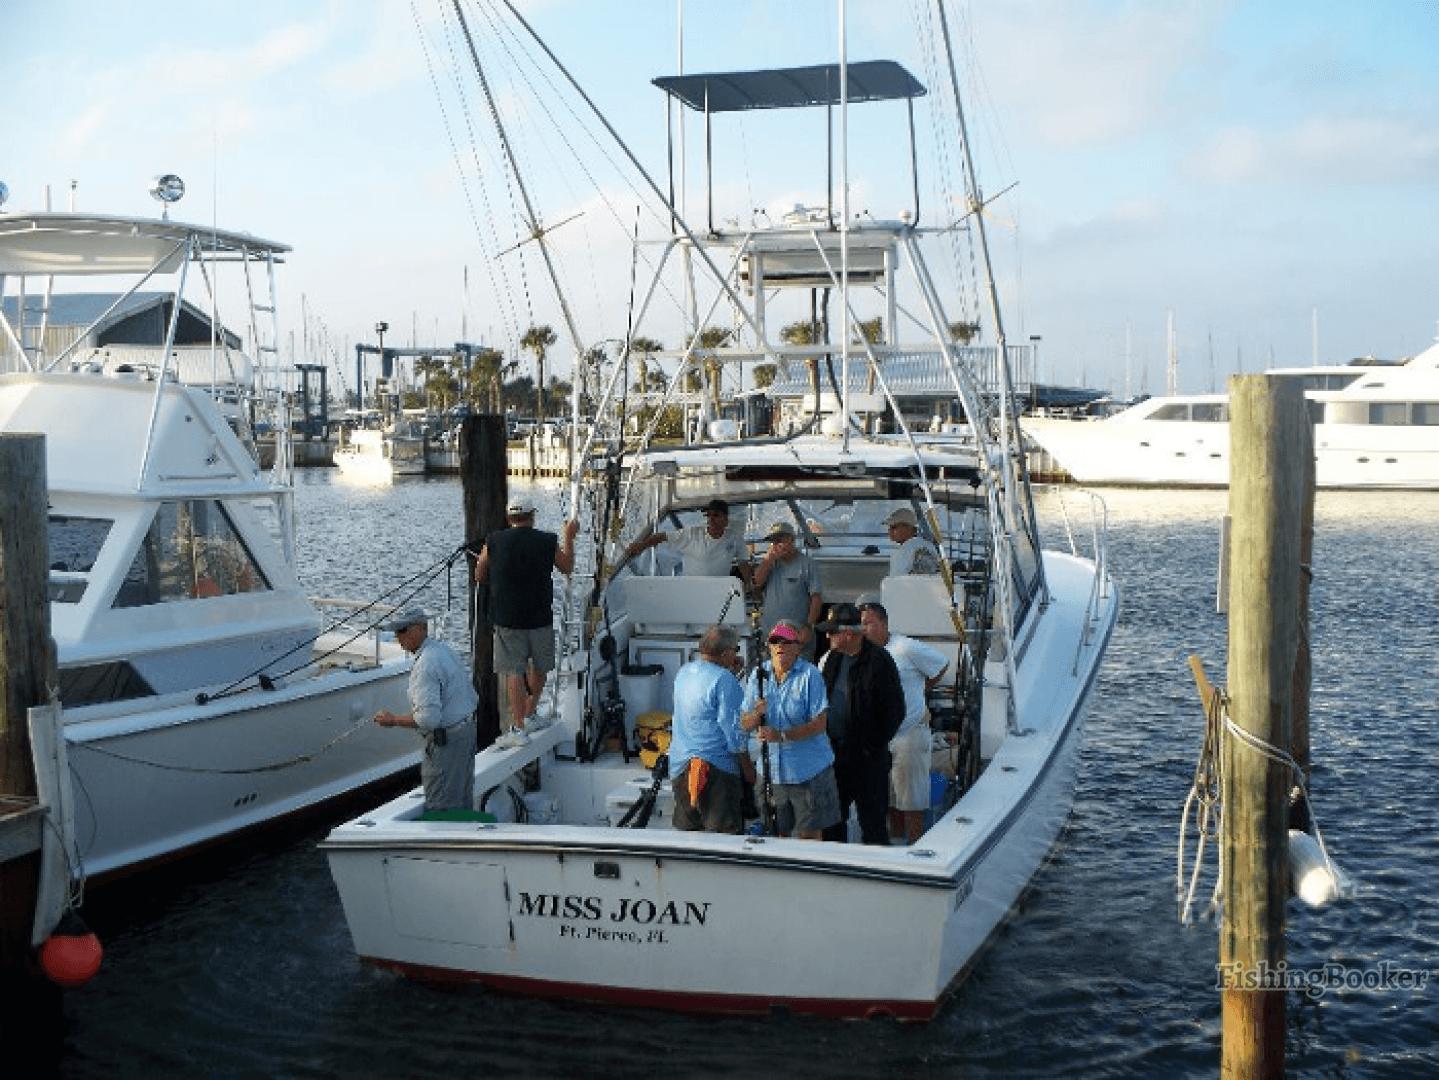 Miss joan deep sea fishing fort pierce florida for Fishing charters fort pierce fl